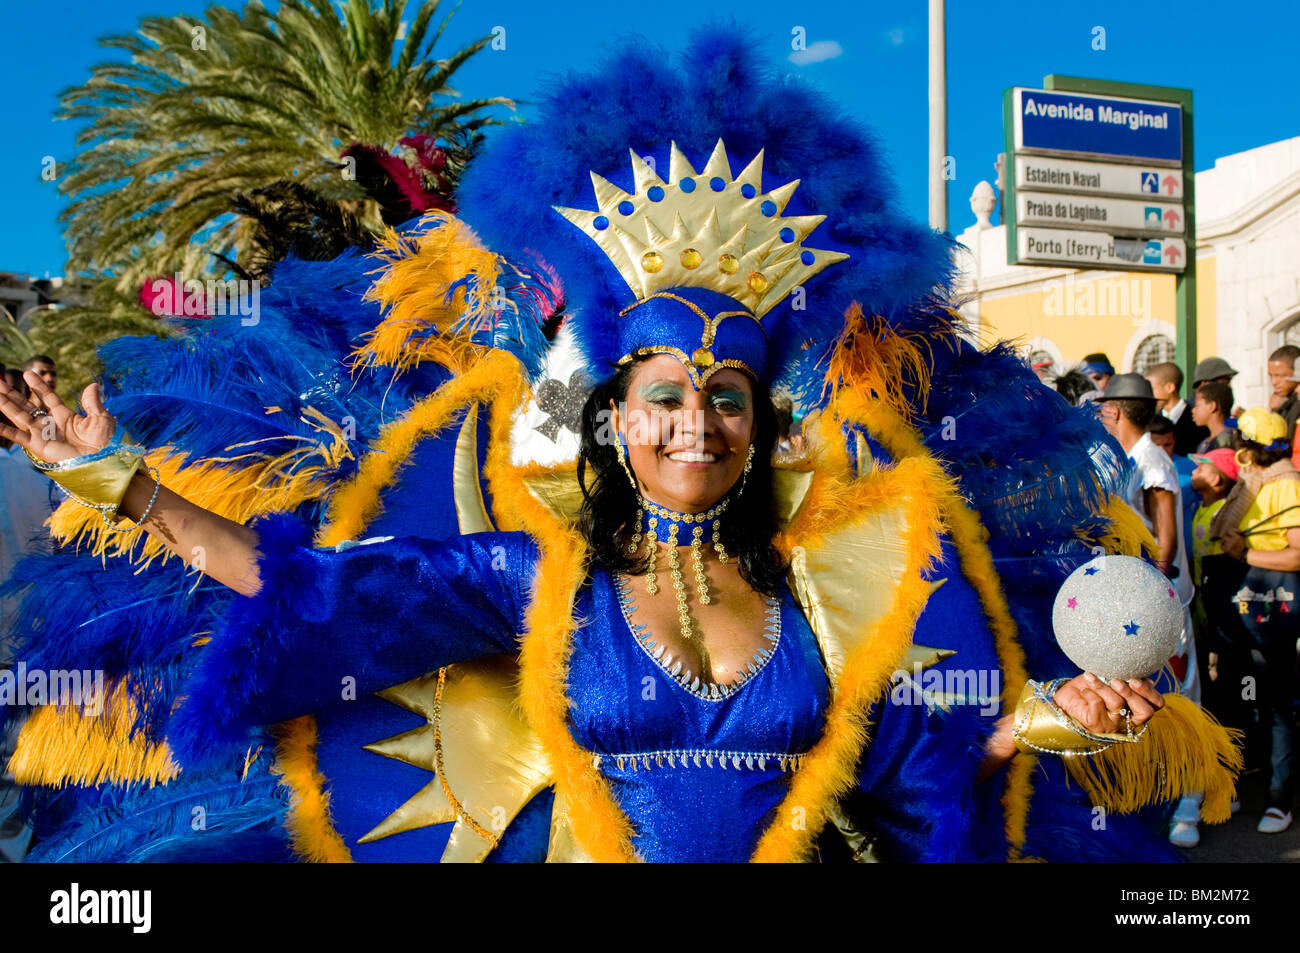 Pretty Woman en coloridos trajes de carnaval, Mindelo, Sao Vicente, Cabo Verde Imagen De Stock